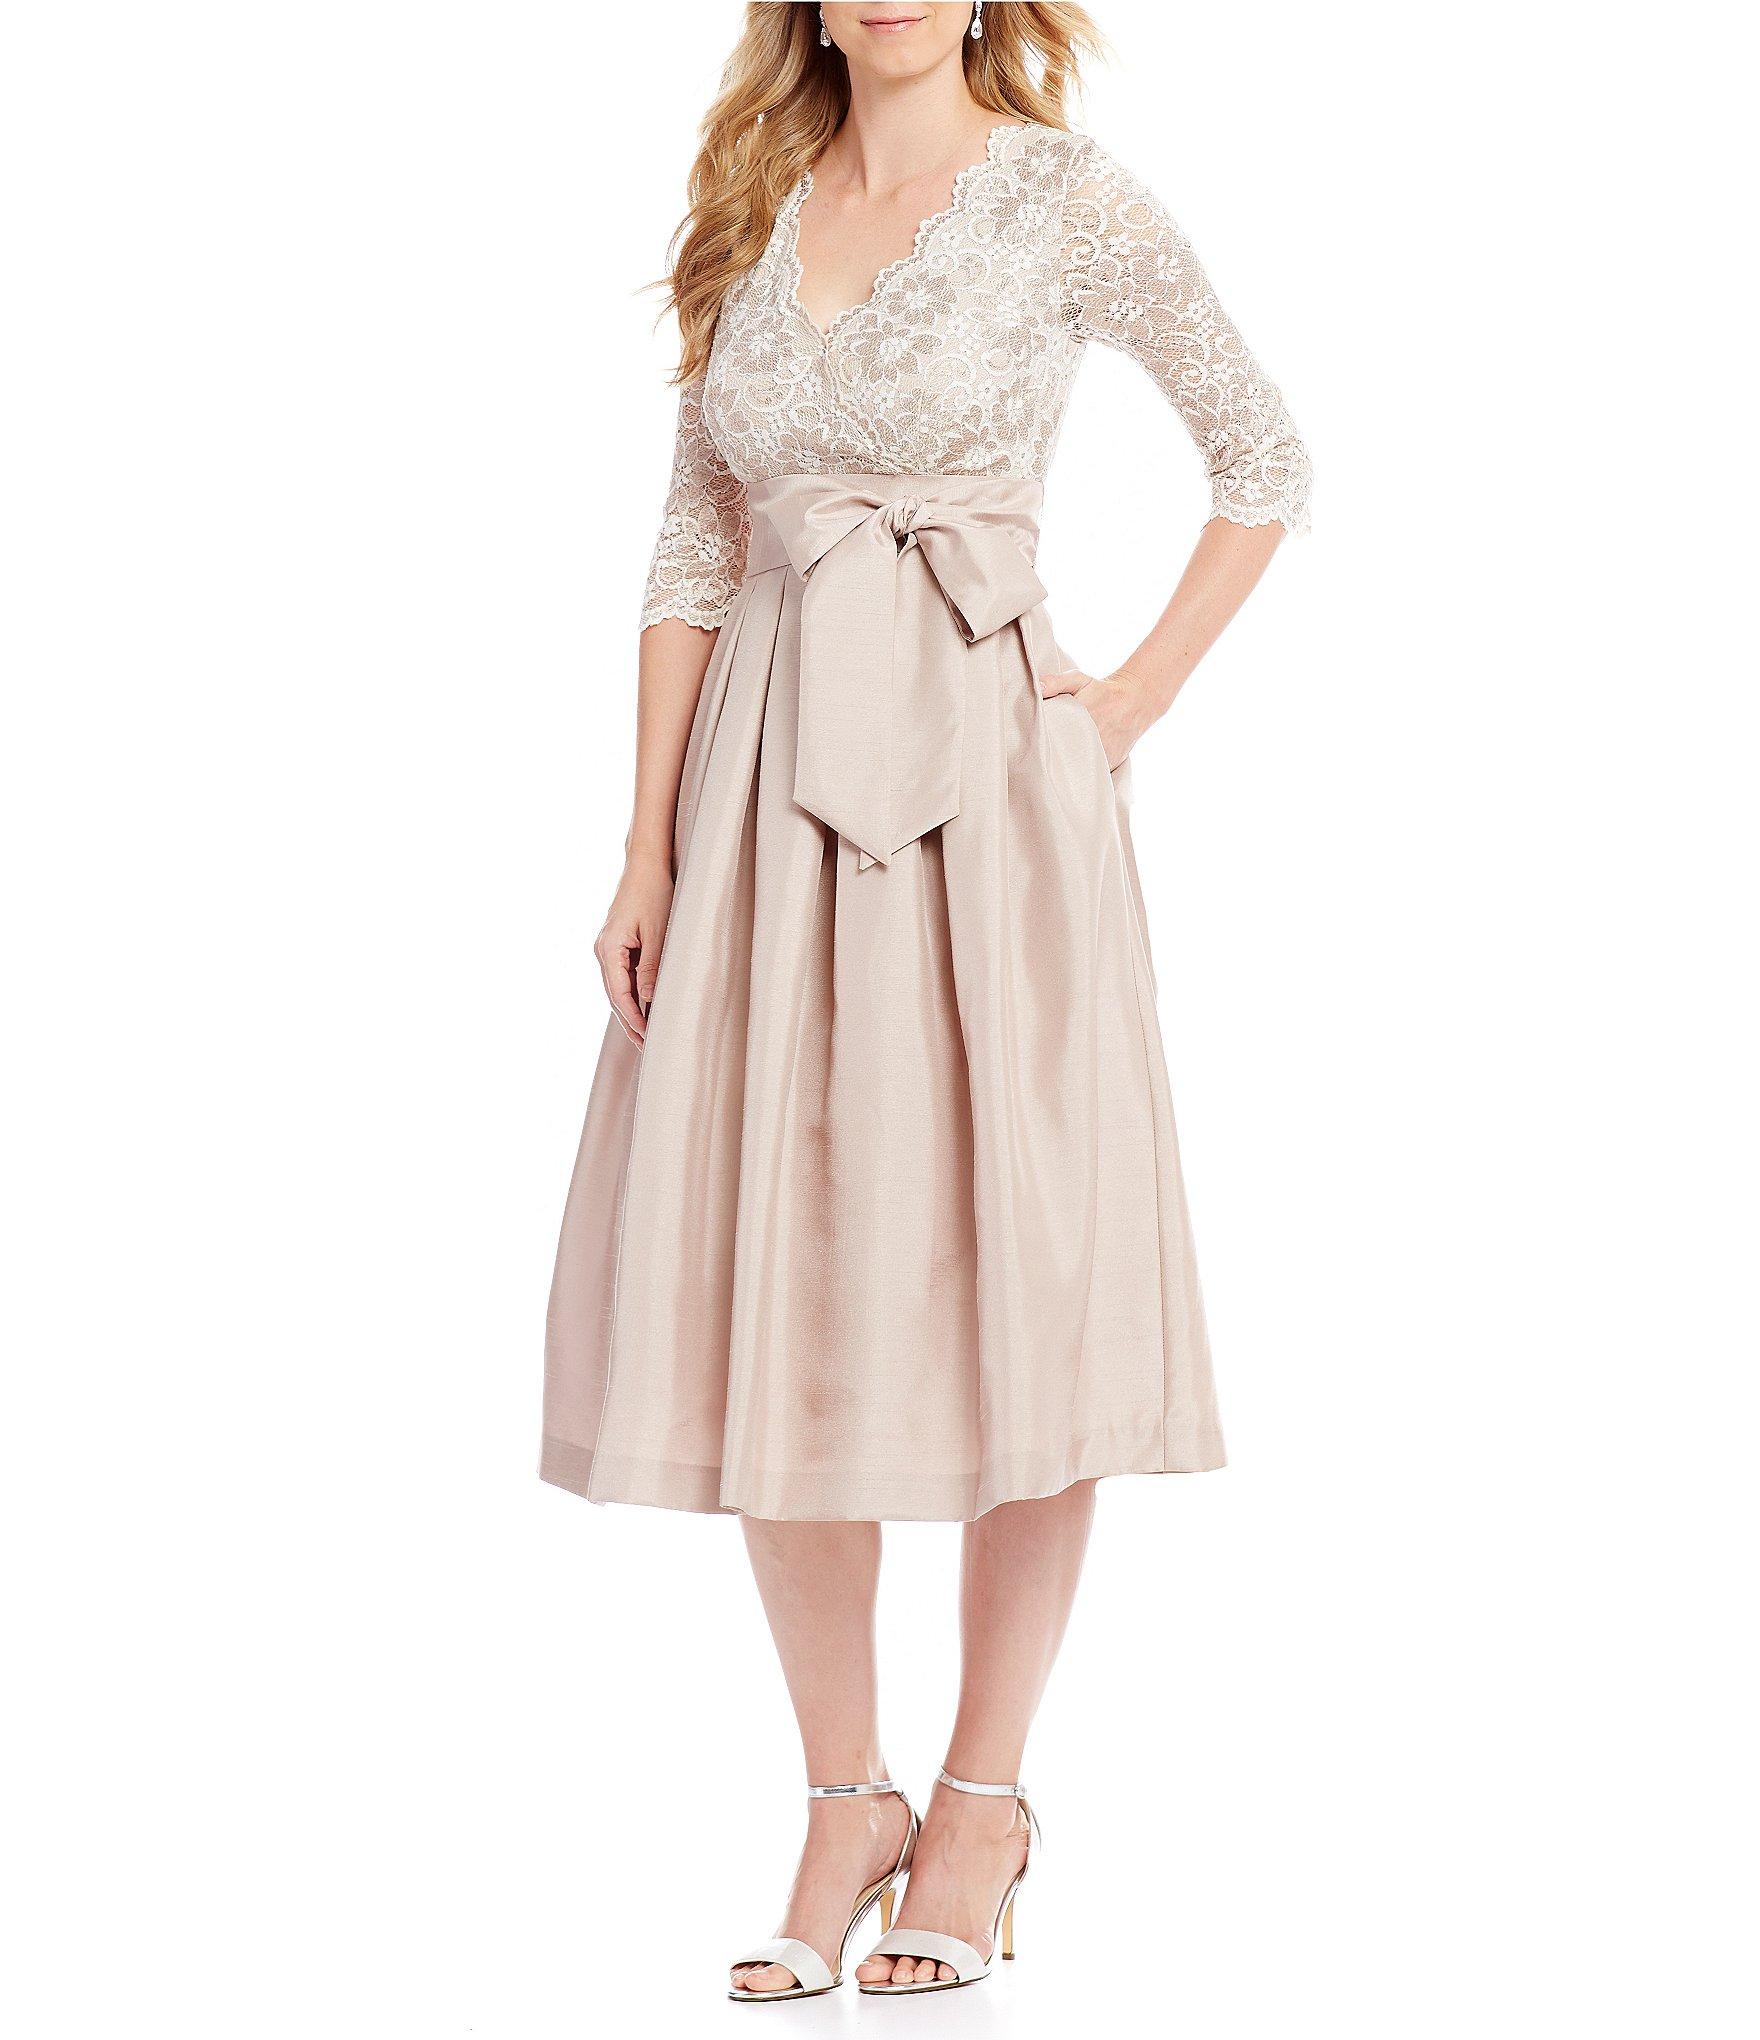 Womens wedding dresses bridal gowns dillards ombrellifo Gallery